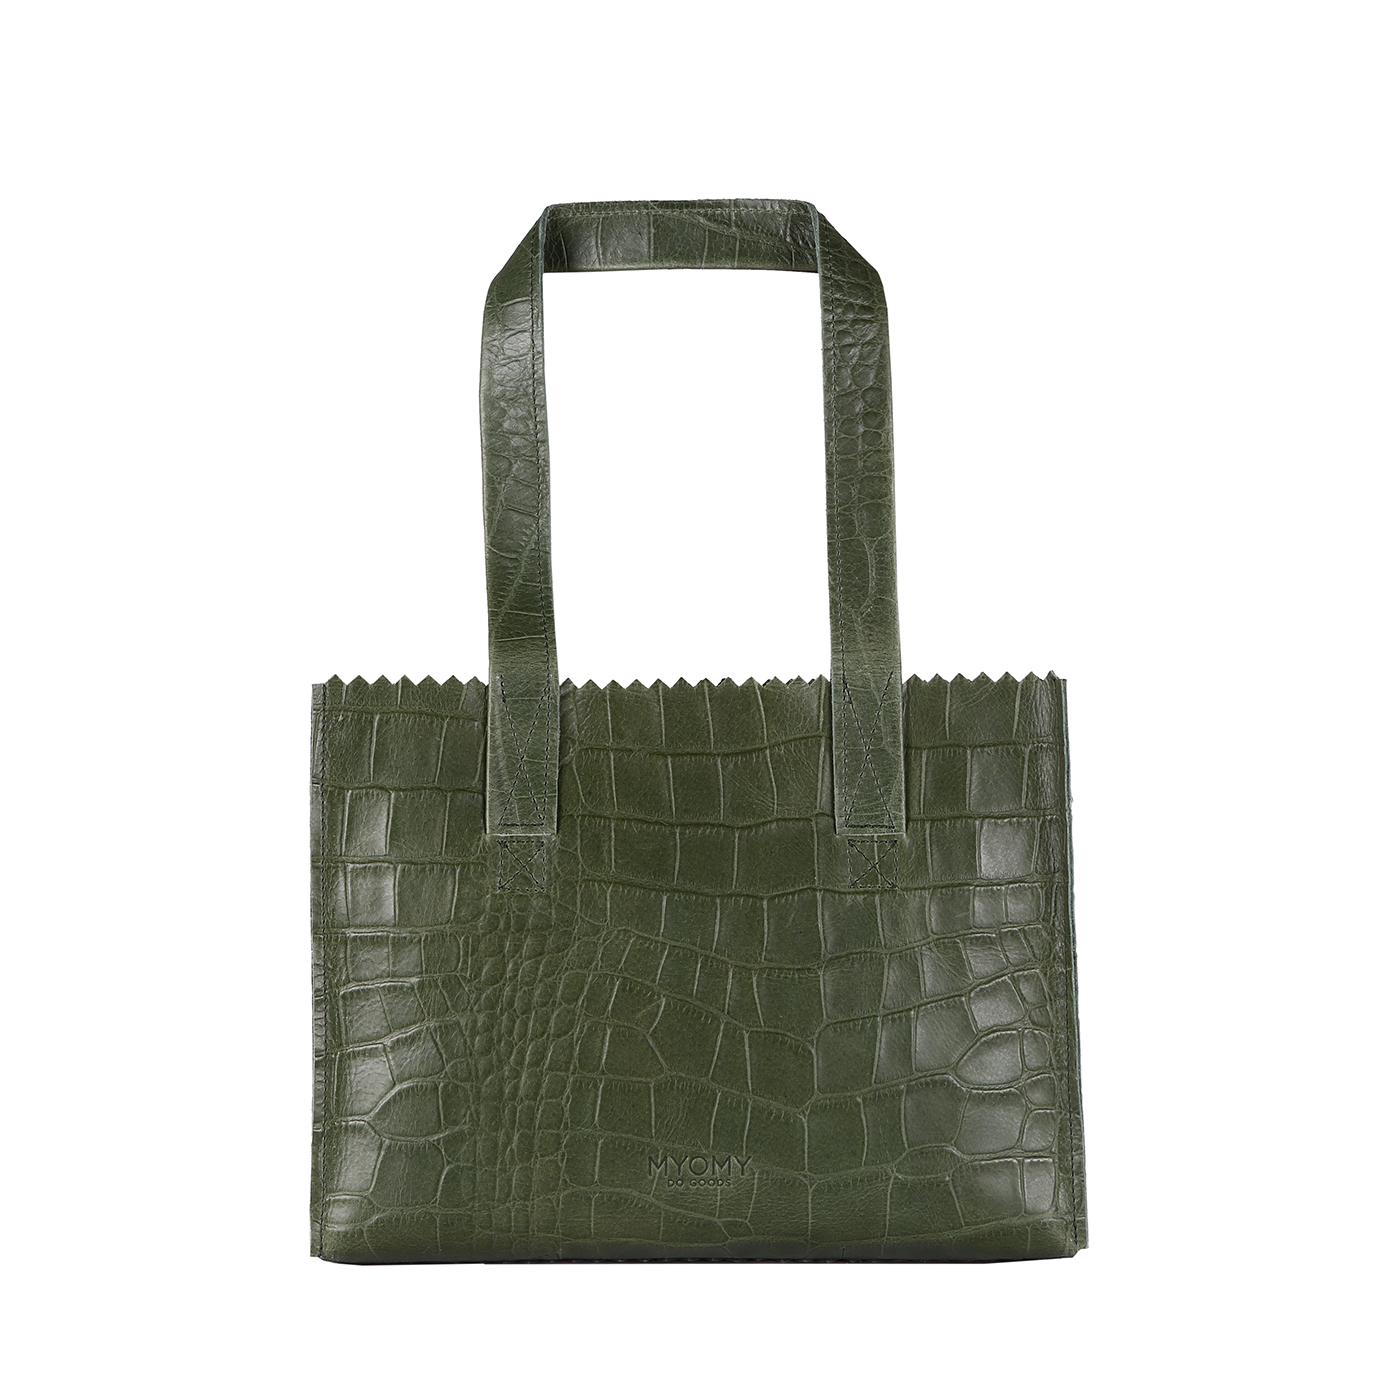 MY PAPER BAG Handbag - croco vetiver green